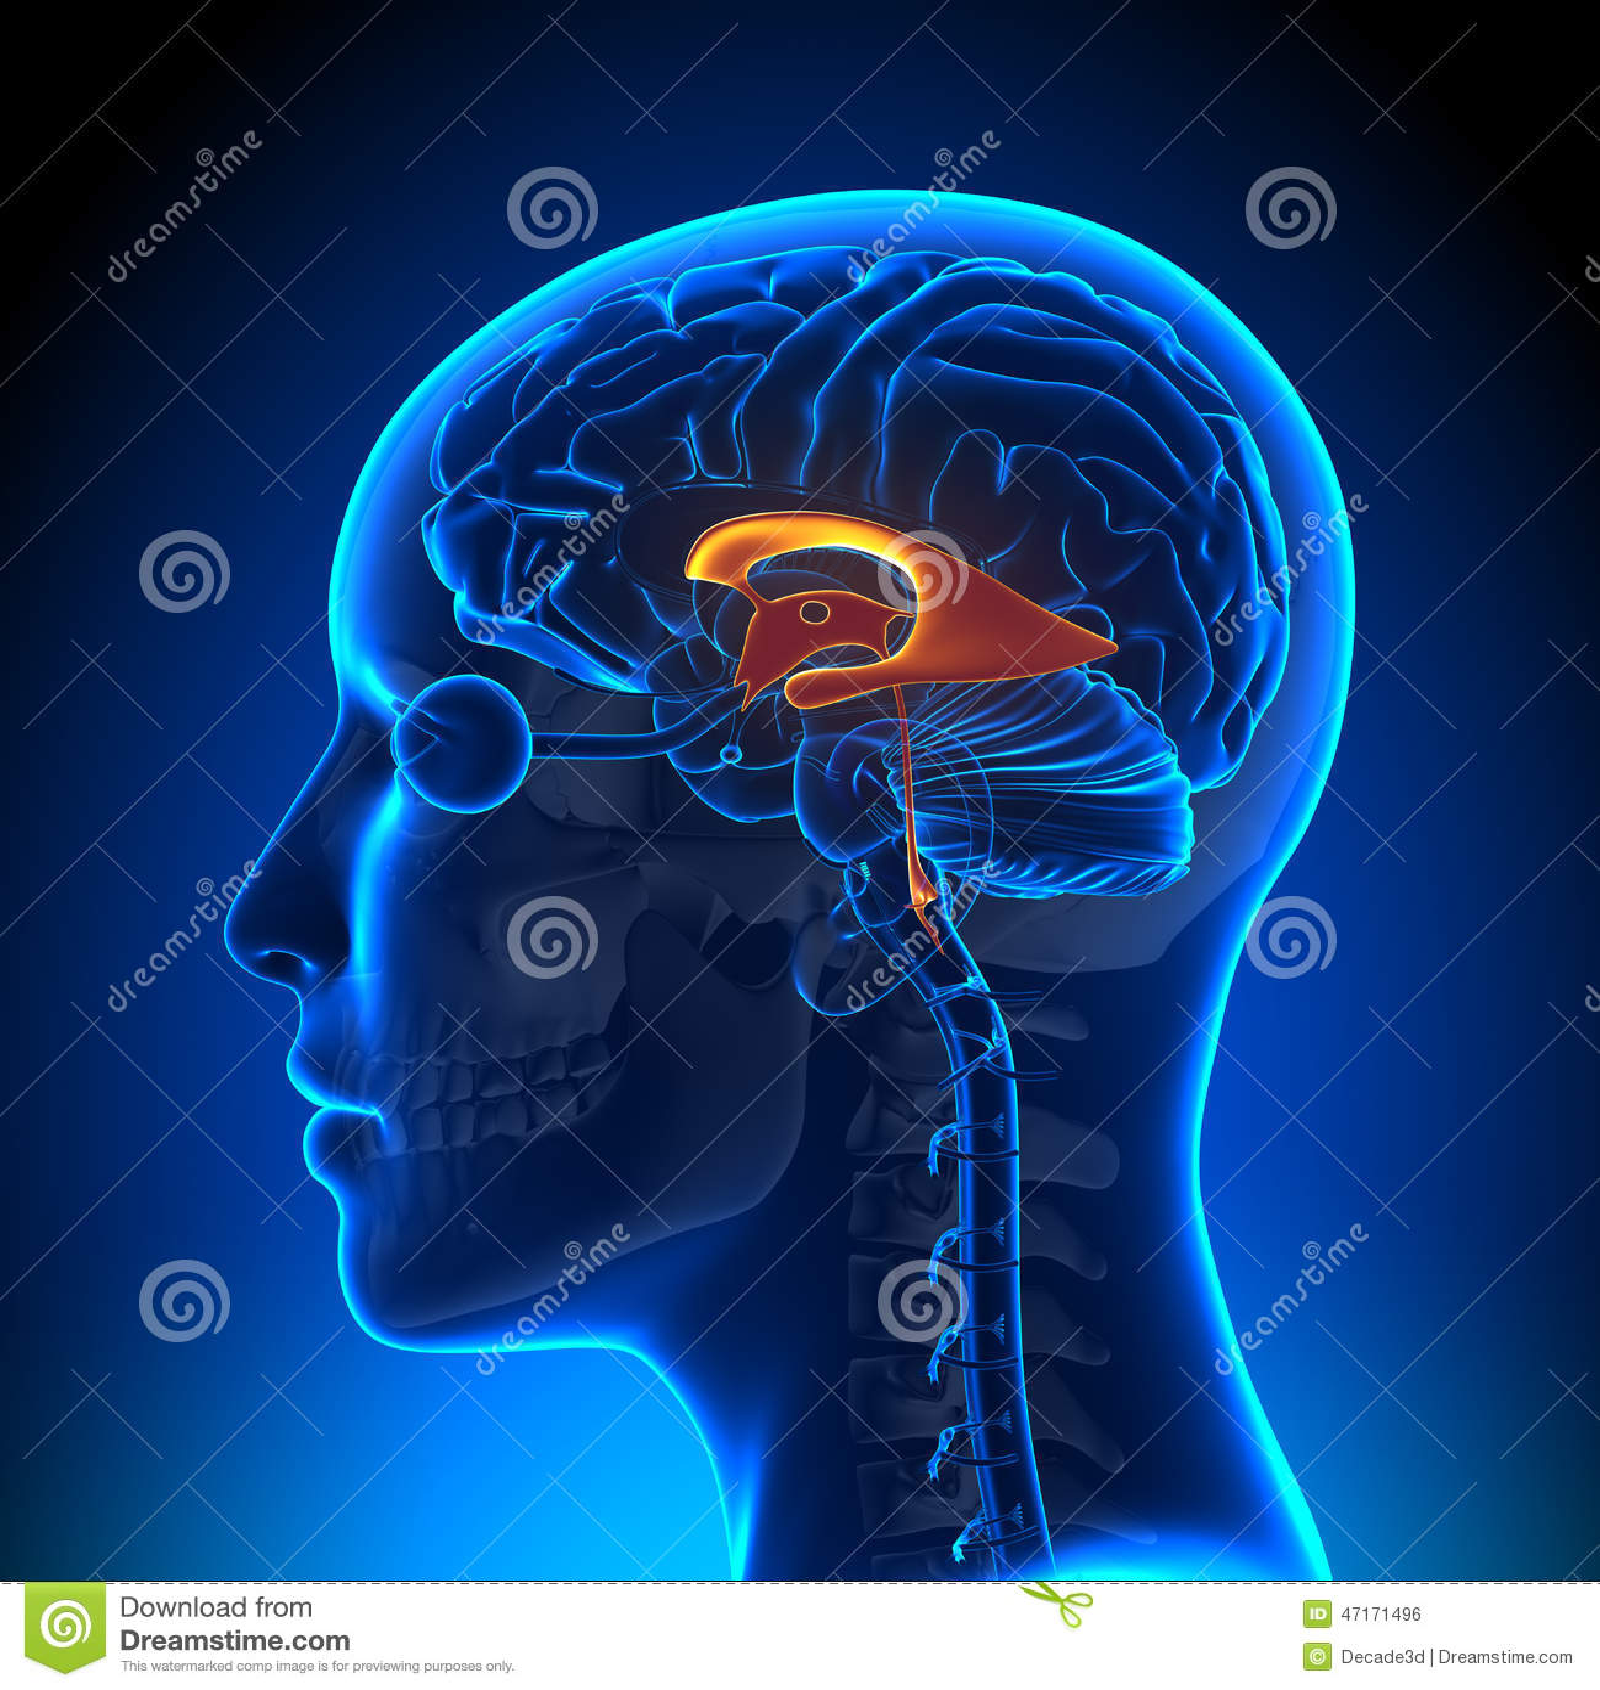 Female Ventricles - Anatomy Brain Stock Illustration - Illustration ...